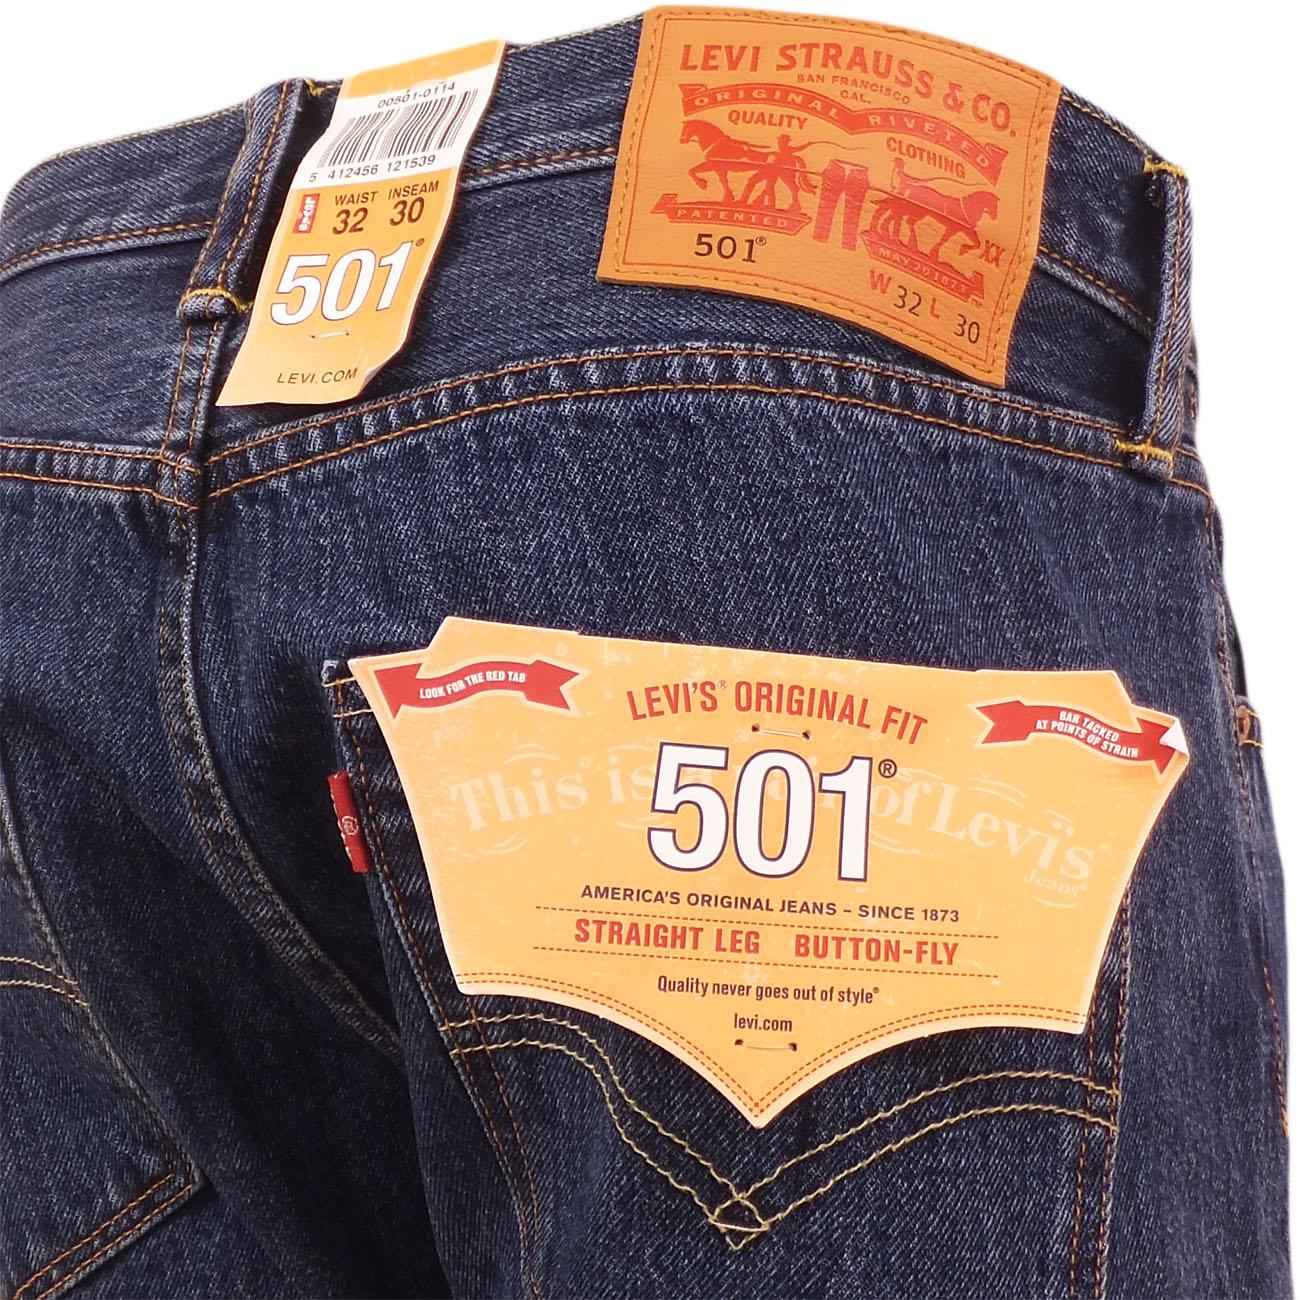 Mediados Strauss Levi's Detalles Ver Jean Original Pantalón Para Azul De Hombre Denim Stonewash Levi 501 Título WD9EHe2IY